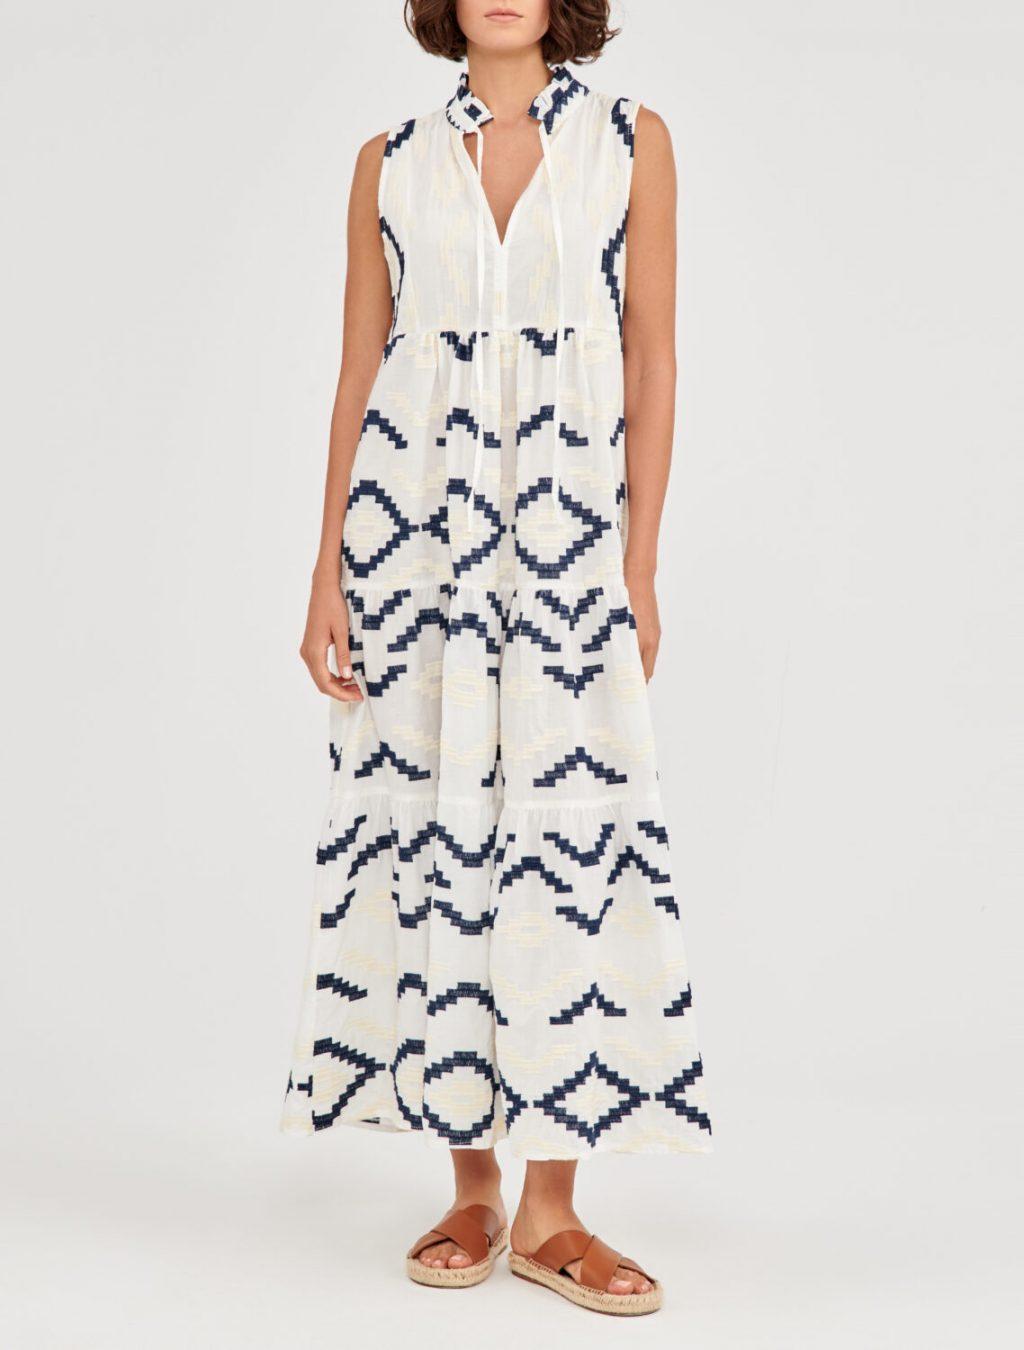 Collection Spring - Summer 2021 GREEK ARCHAIC KORI BOHO MAXI DRESS EMBROIDERED